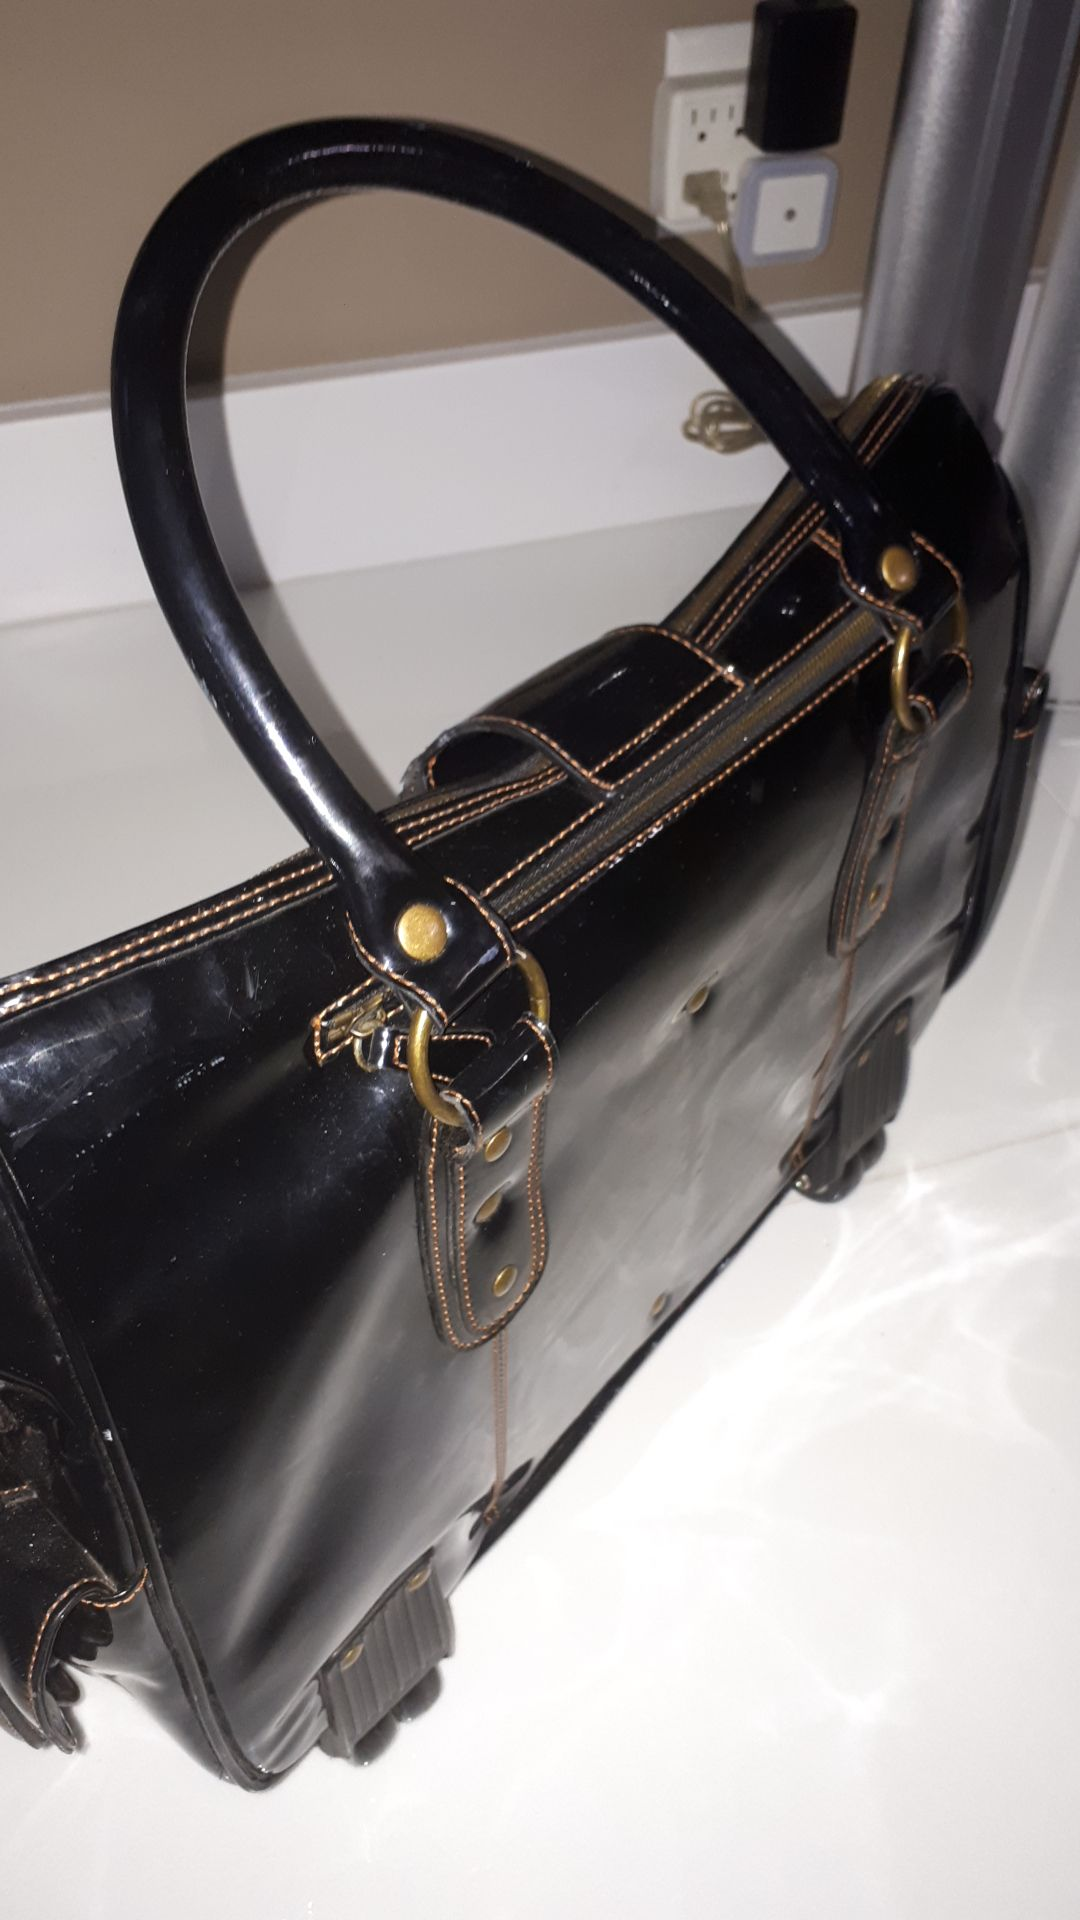 GJ Gillian Julius Eco Leather Rolling Bag